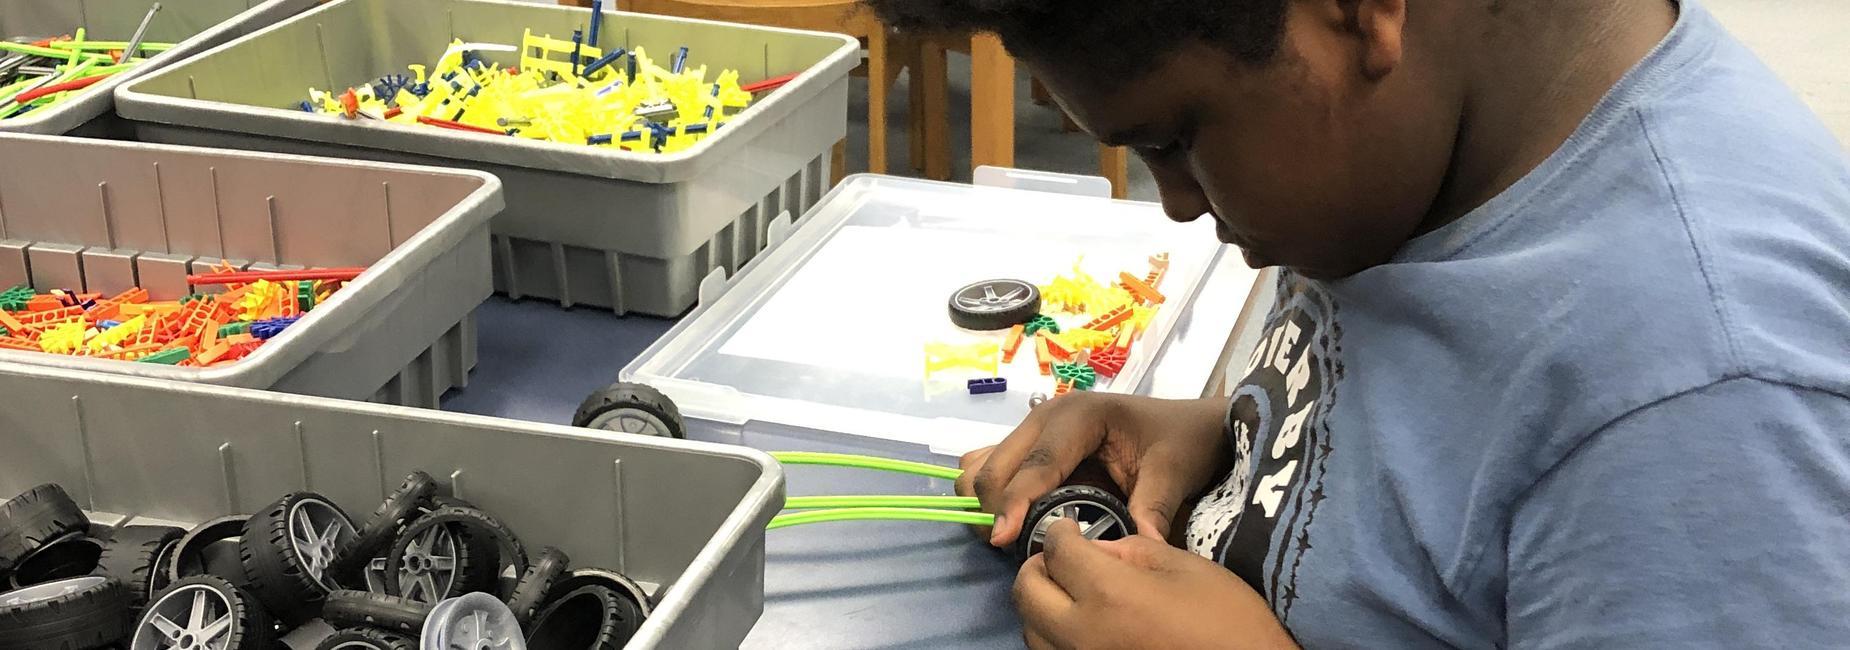 student working with K'Nex in STEM lab